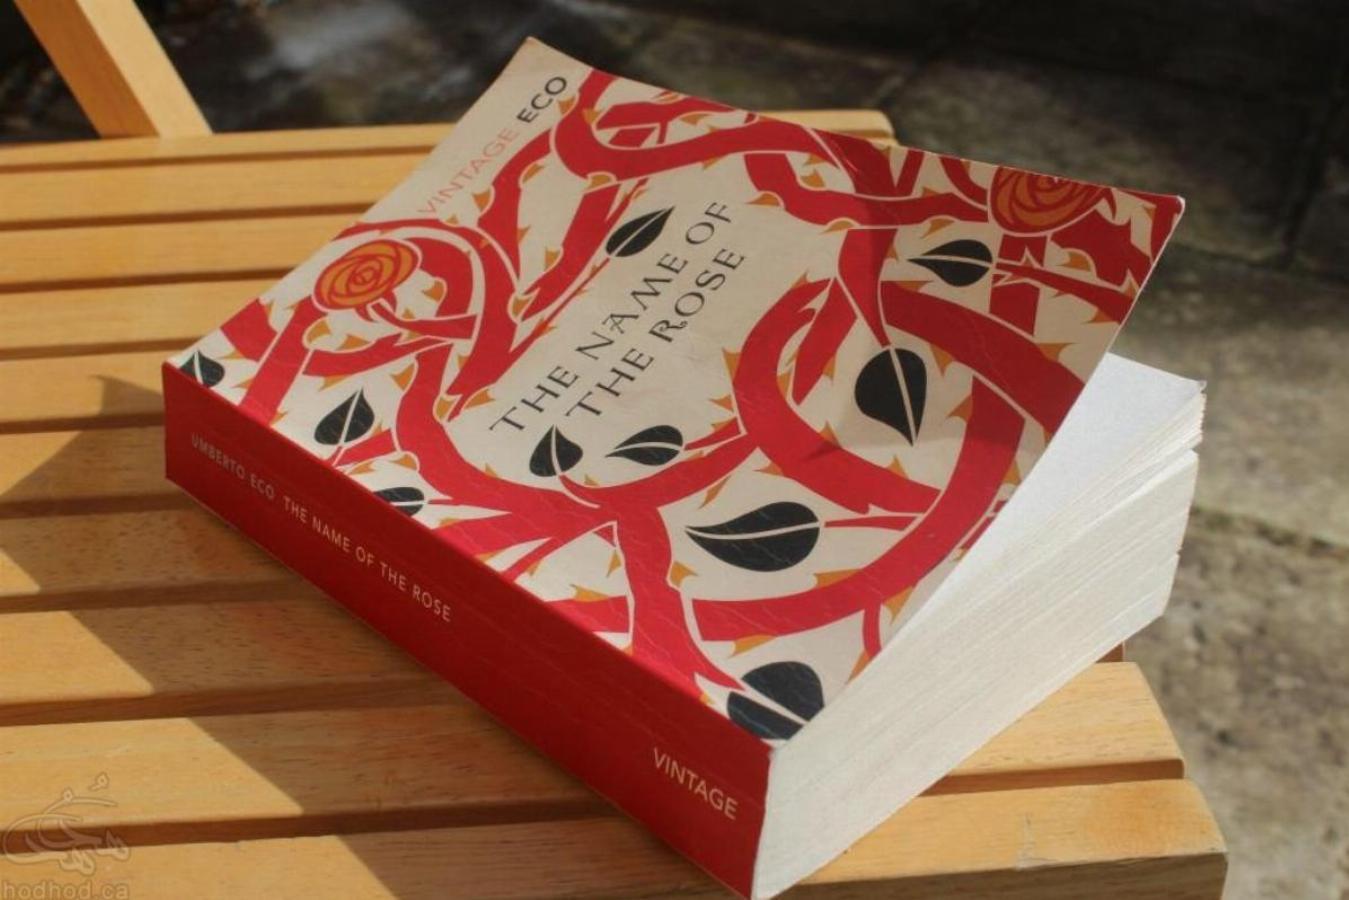 معرفی کتاب: نام گل سرخ اثر اومبرتو اکو